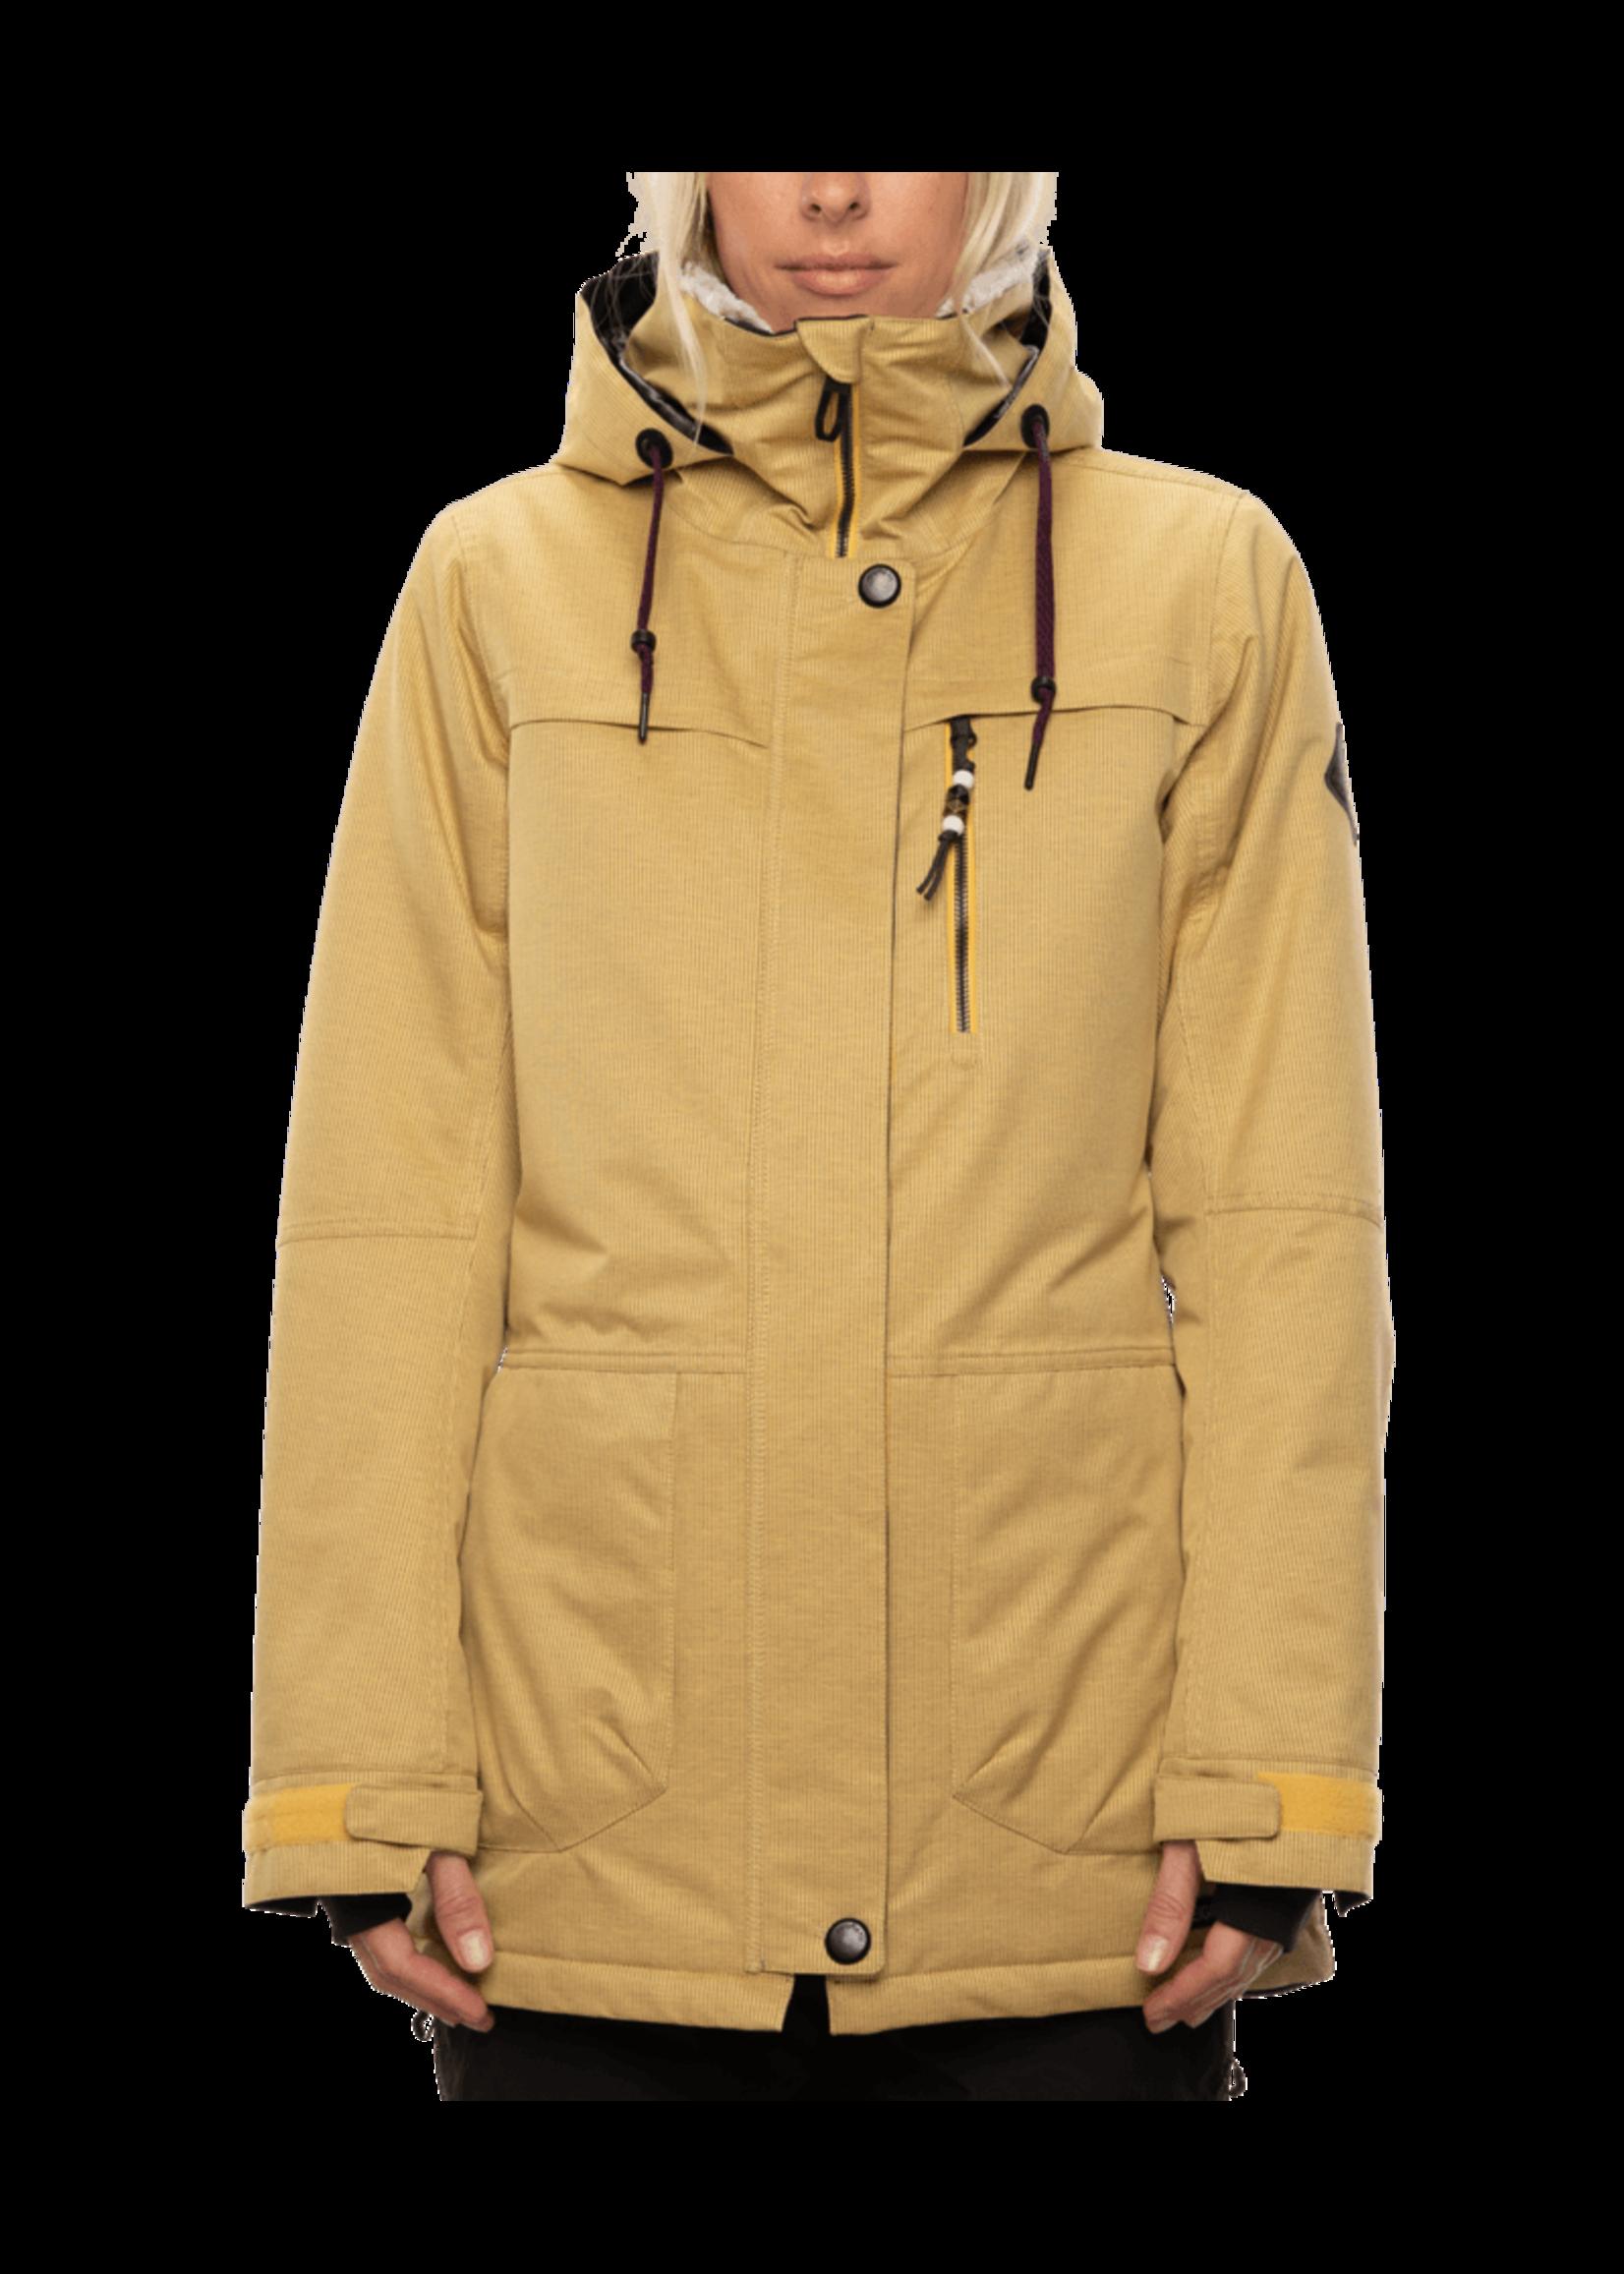 686 686 Spirit Insulated Jacket